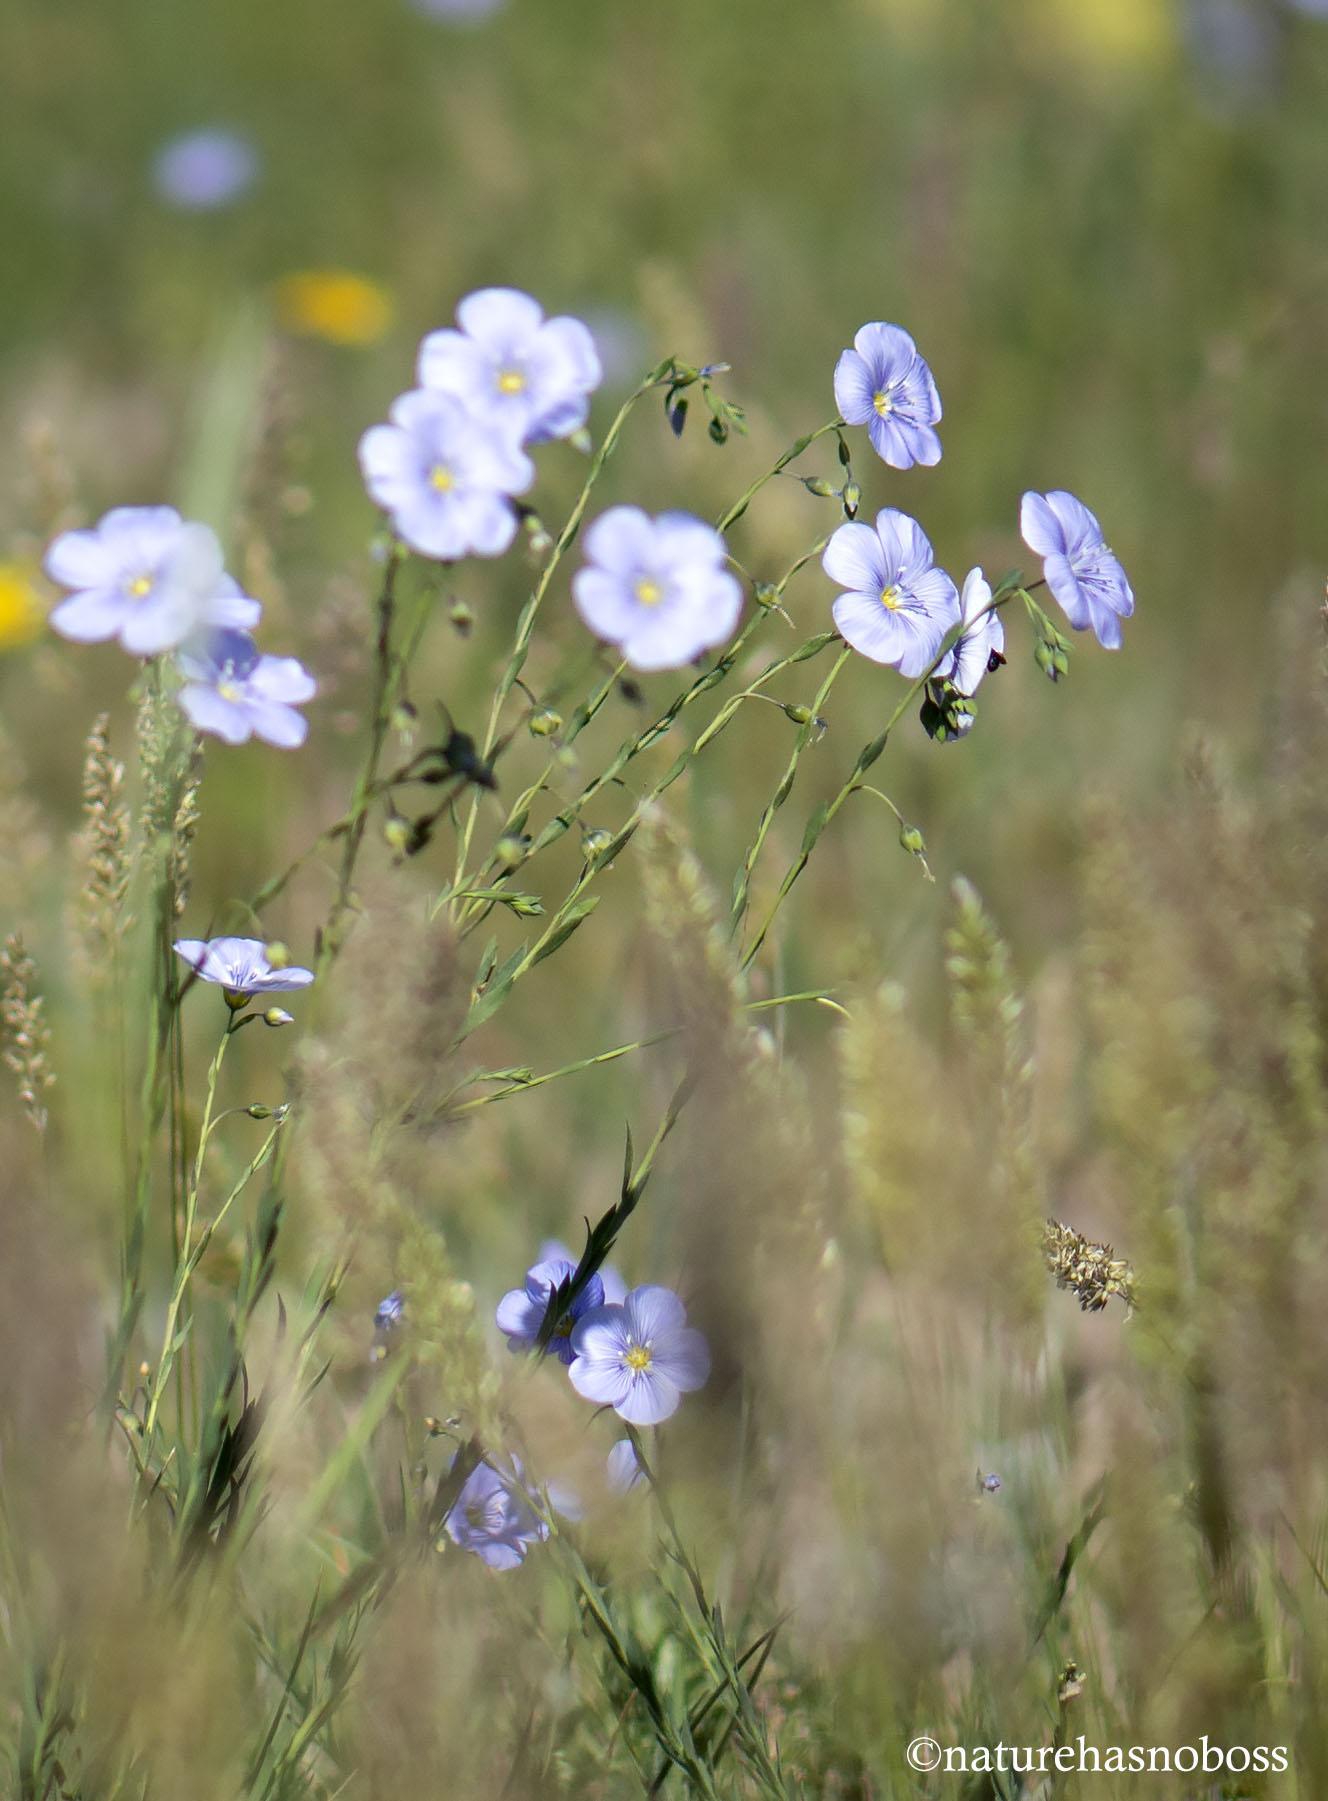 Blue_flax_4 copy